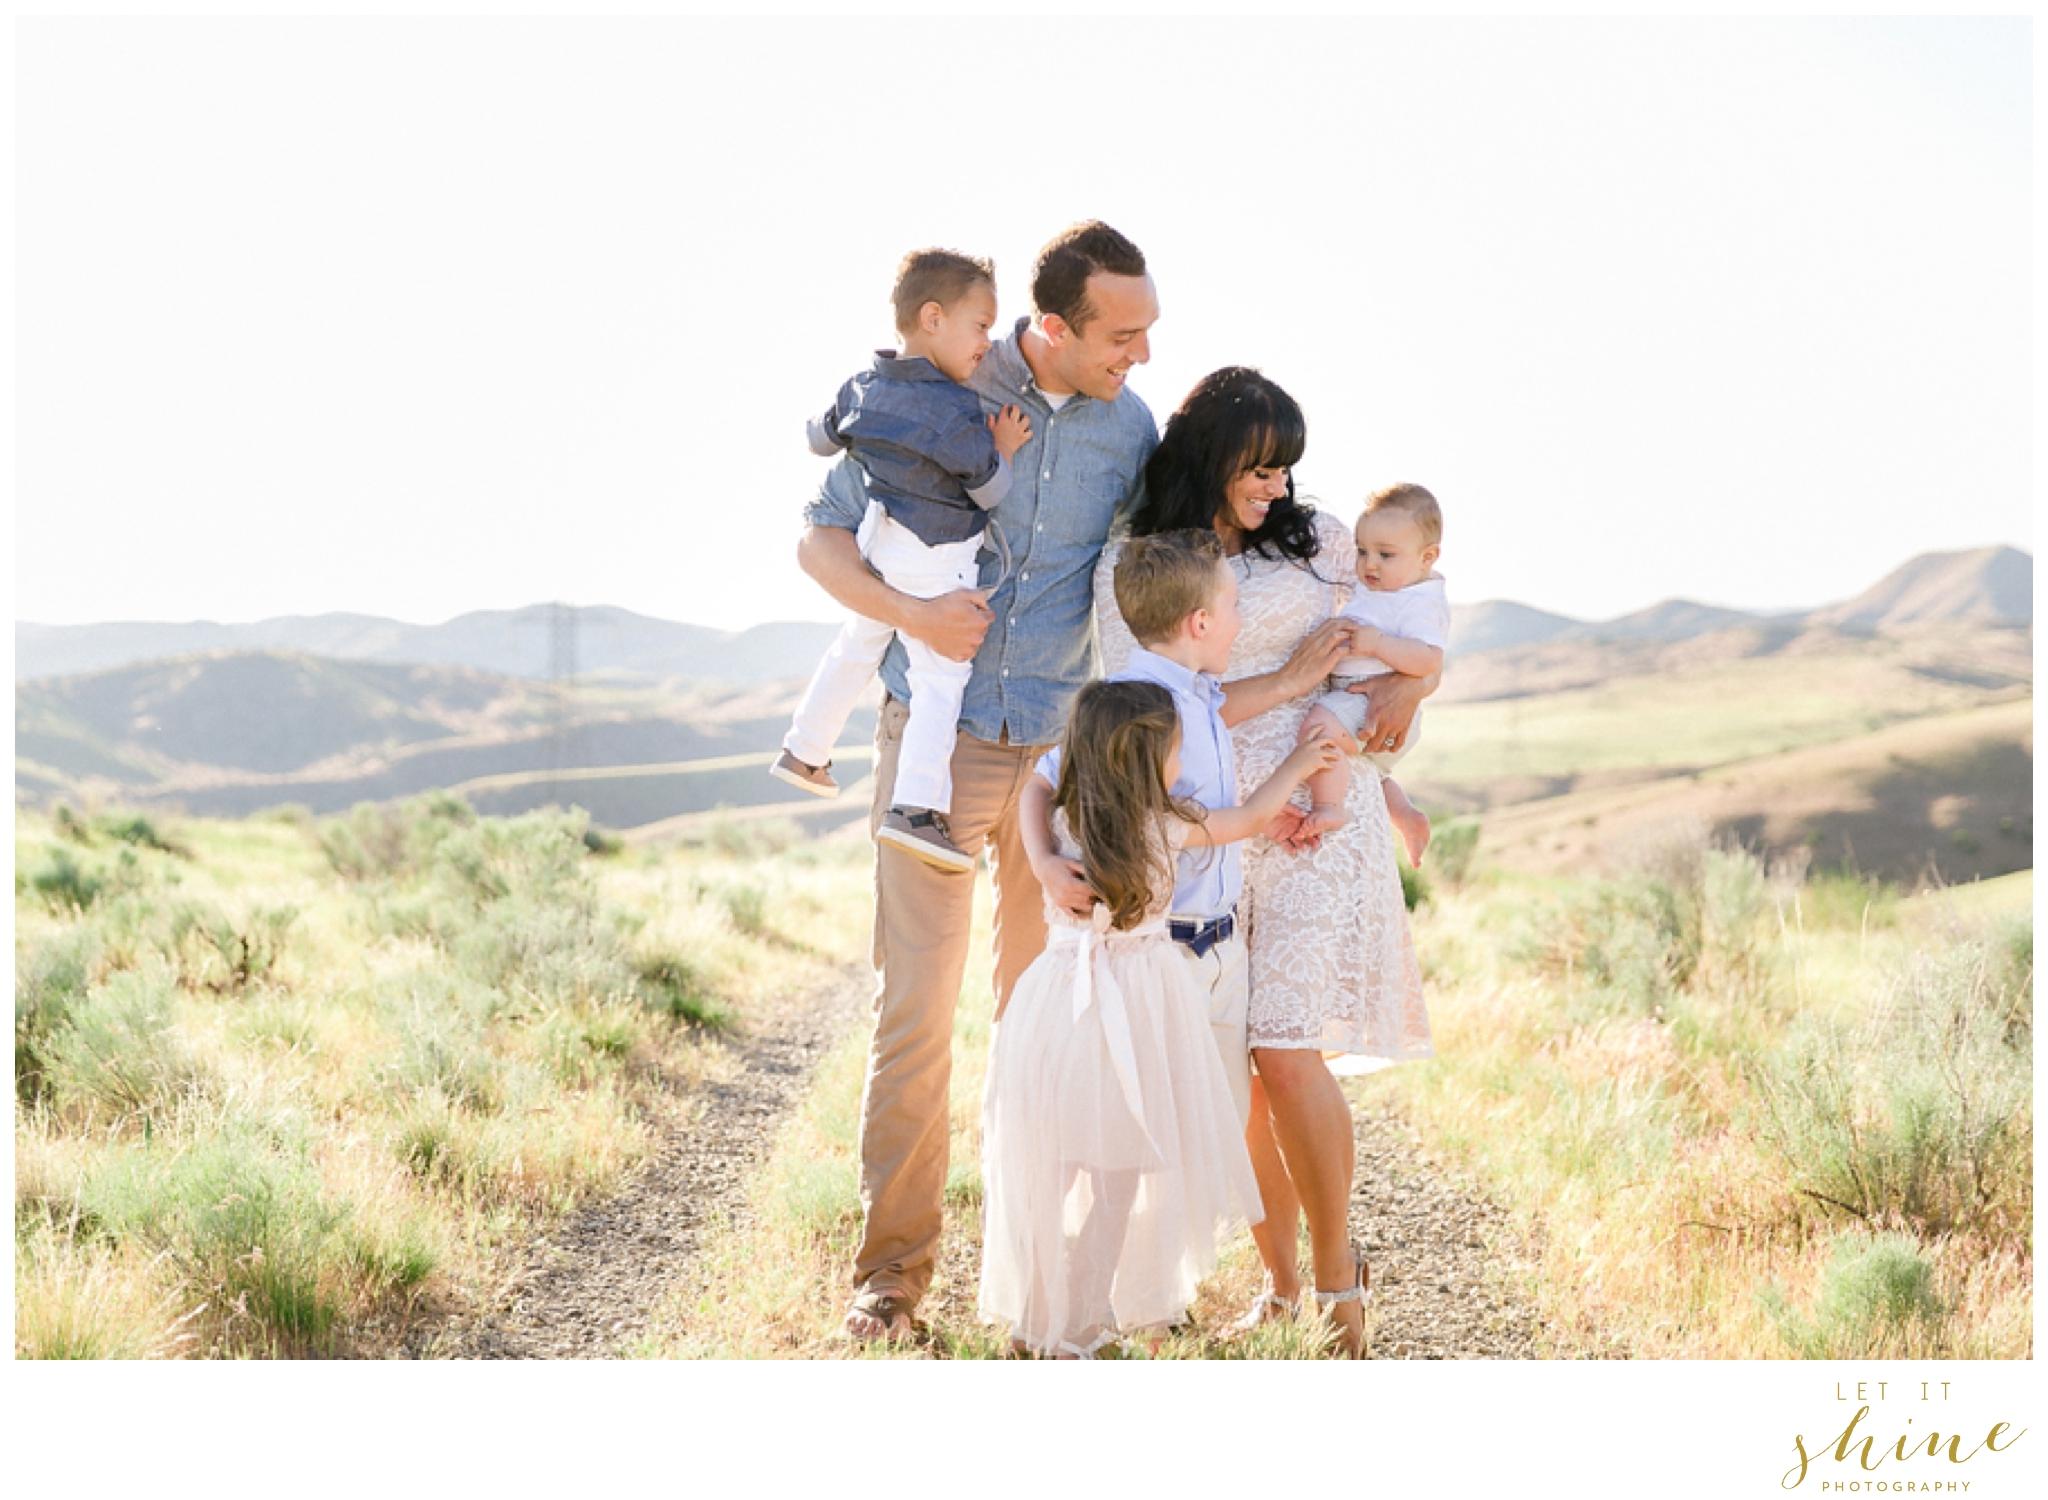 Boise Lifestyle Family Photographer-5679.jpg